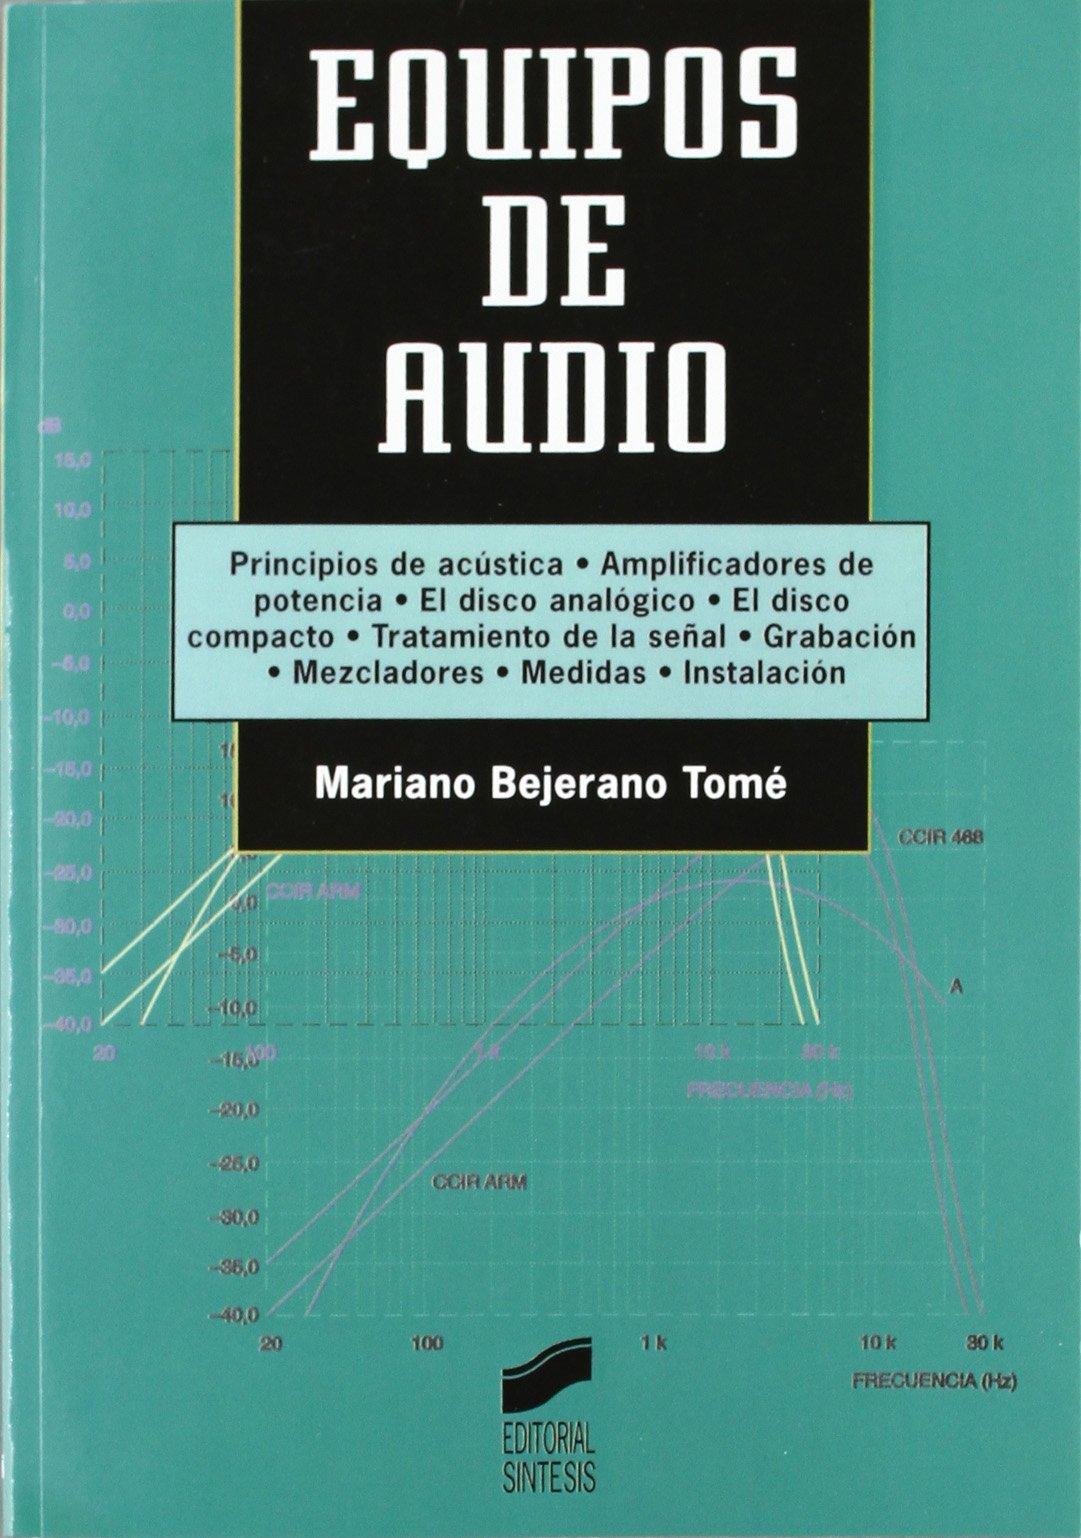 Equipos de Audio (Spanish Edition): Mariano Bejerano Tome: 9788477384571: Amazon.com: Books